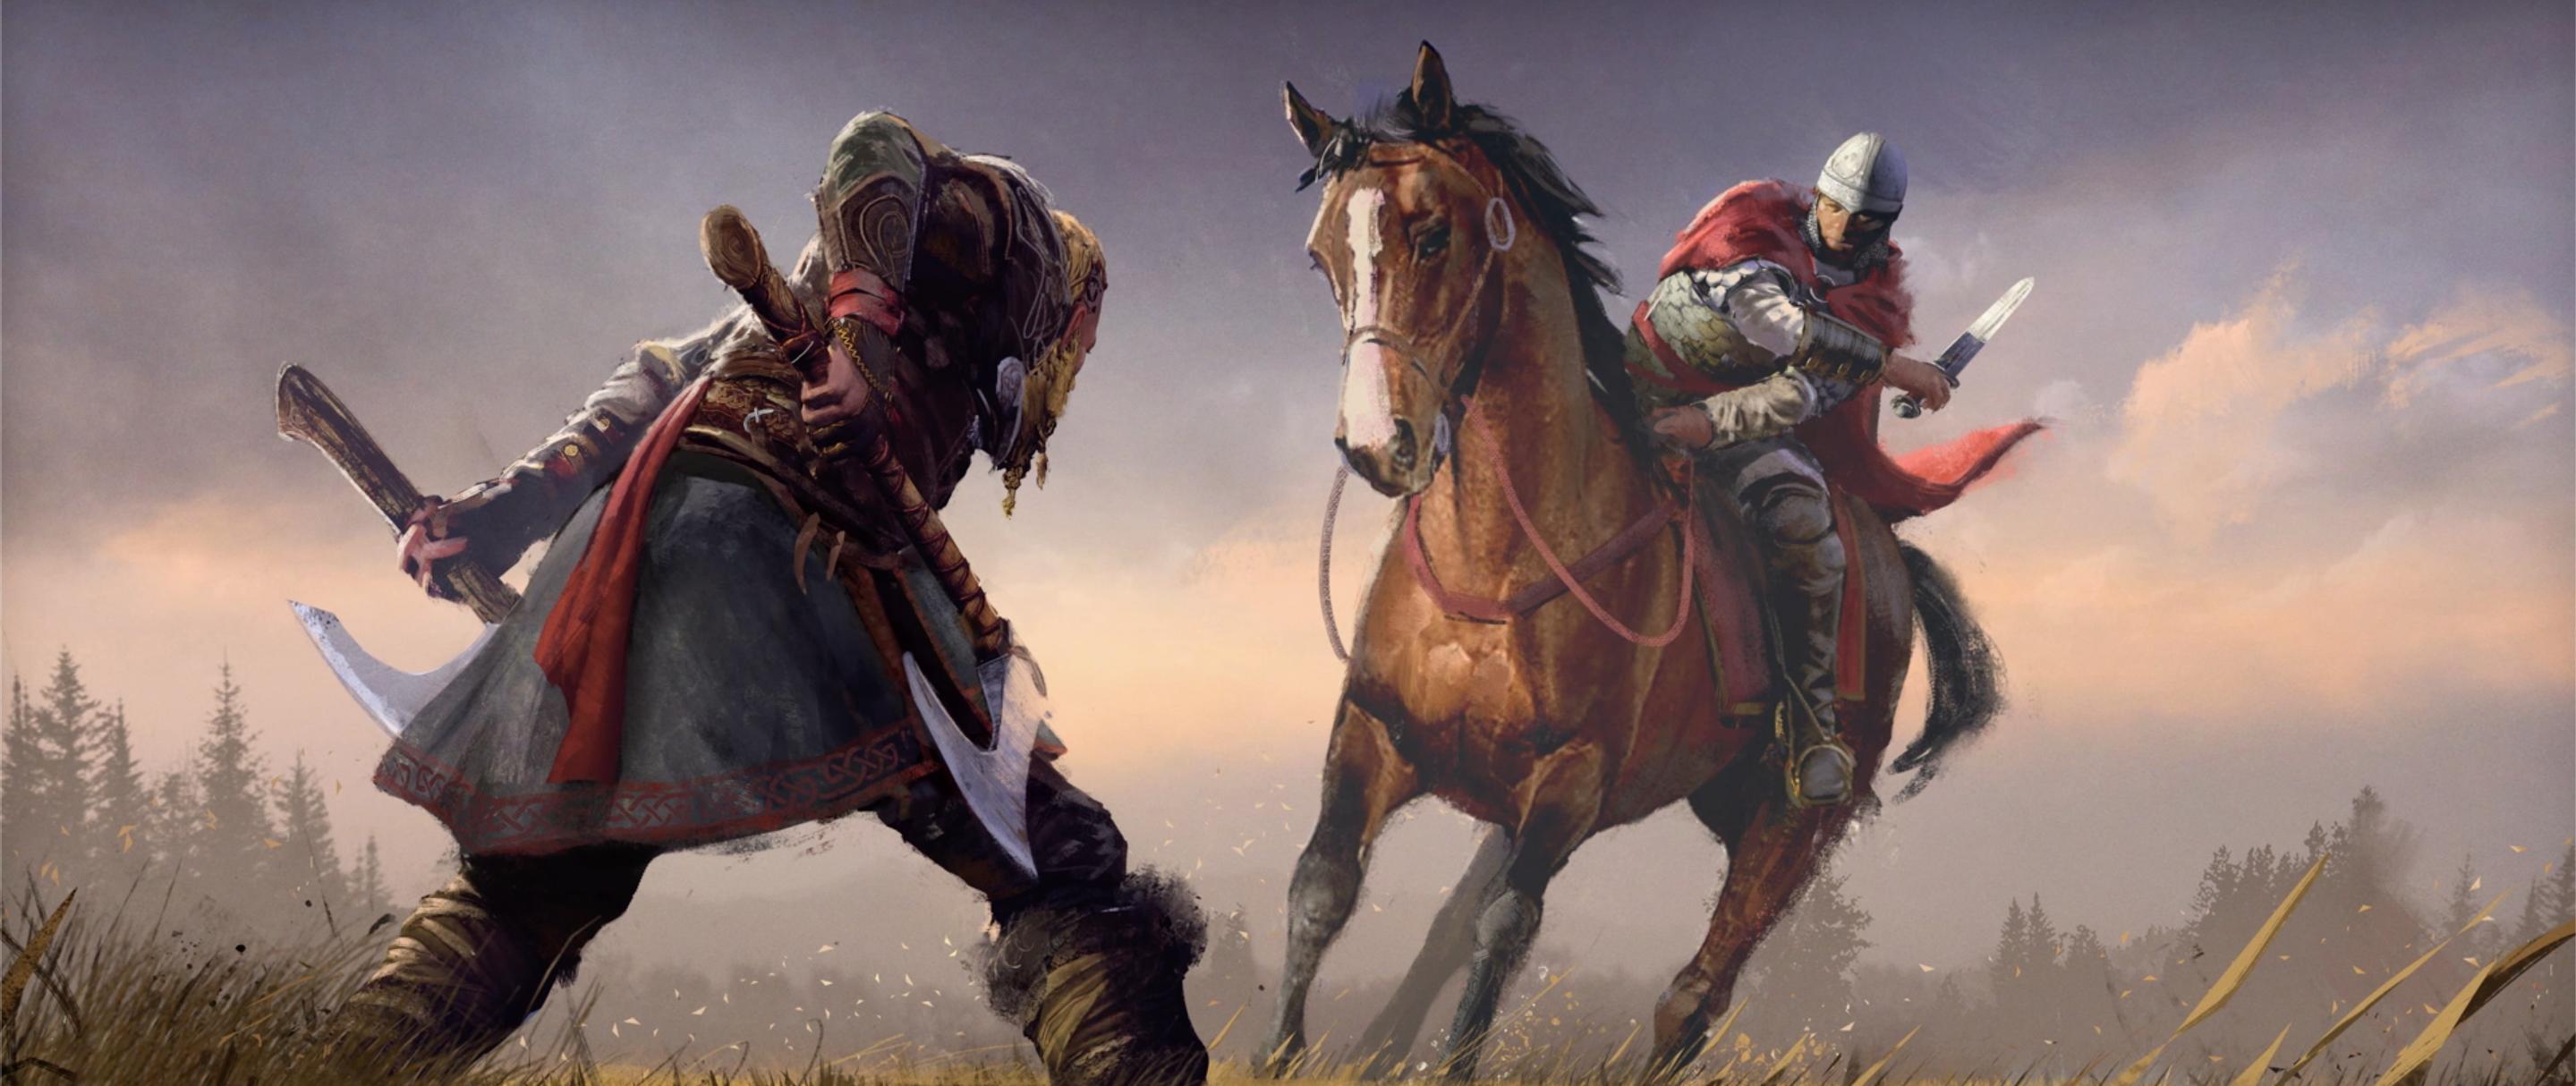 Assassin's Creed Valhalla – Post Launch / Season Pass Content Roadmap